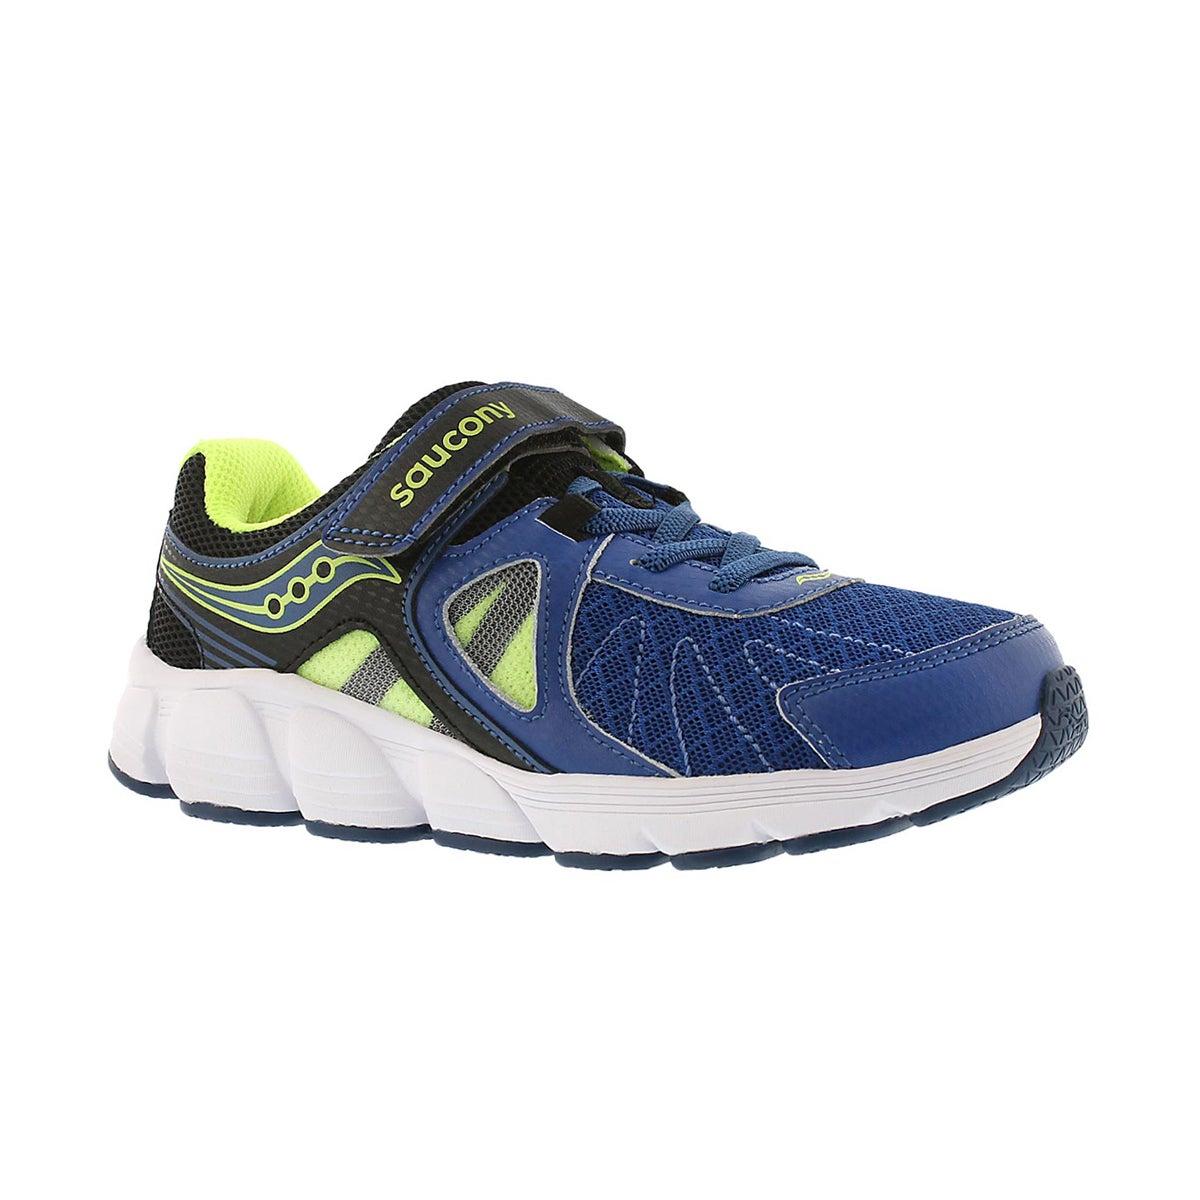 Boys' KOTARO 3 black/blue running shoes